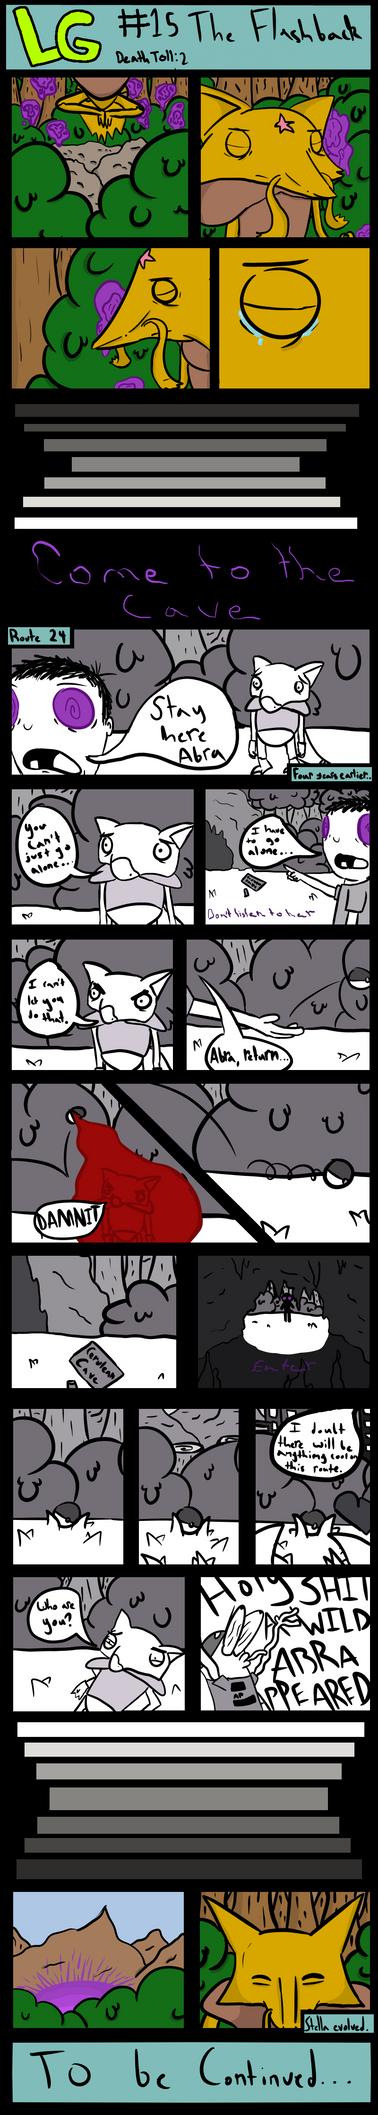 Goomsday: A Gooey Nuzlocke #15: The Flashback by LordGoom